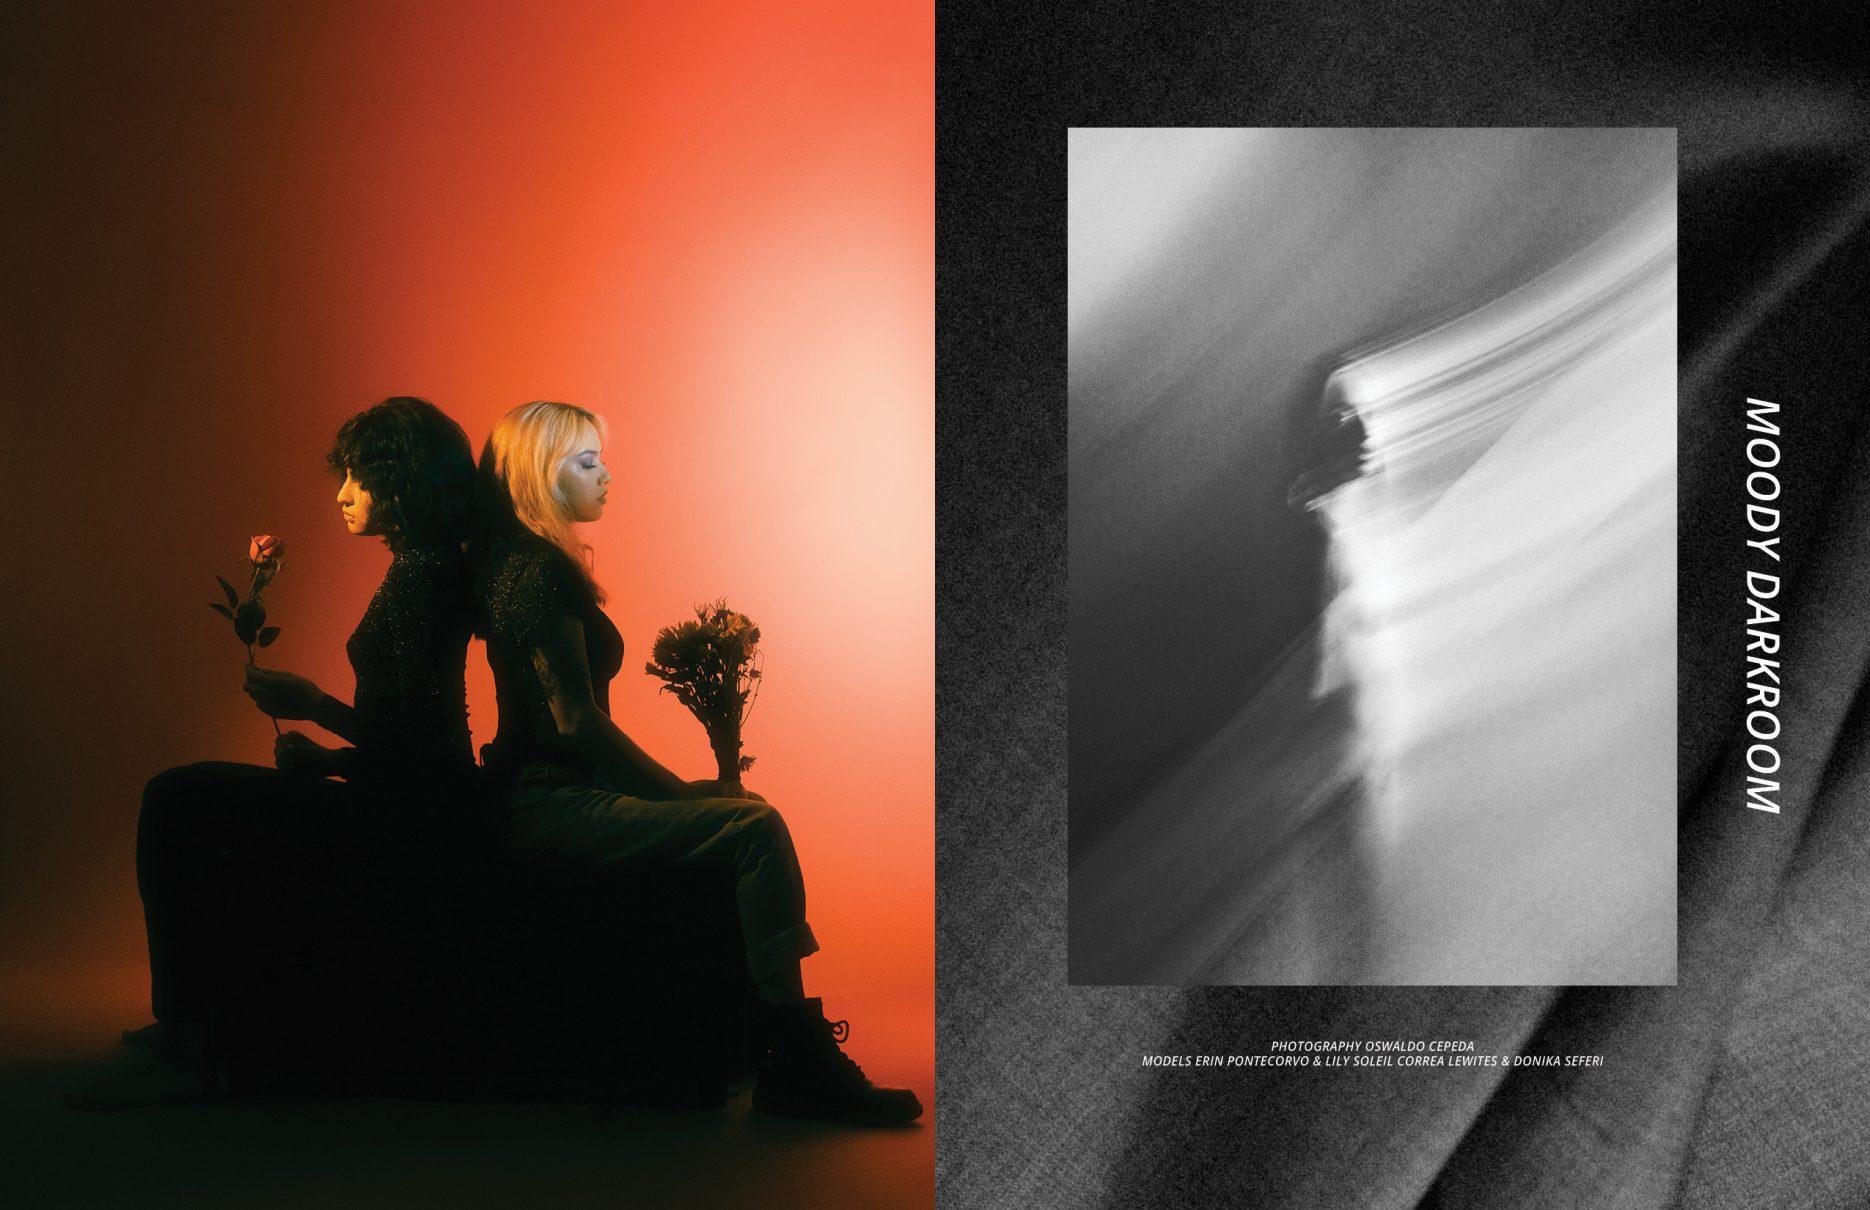 """Moody dark room"" by Oswaldo Cepeda with Erin Pontecorvo & Lily Soleil Correa Lewites & Donika Seferi for editorial Keyi Magazine Berlin"